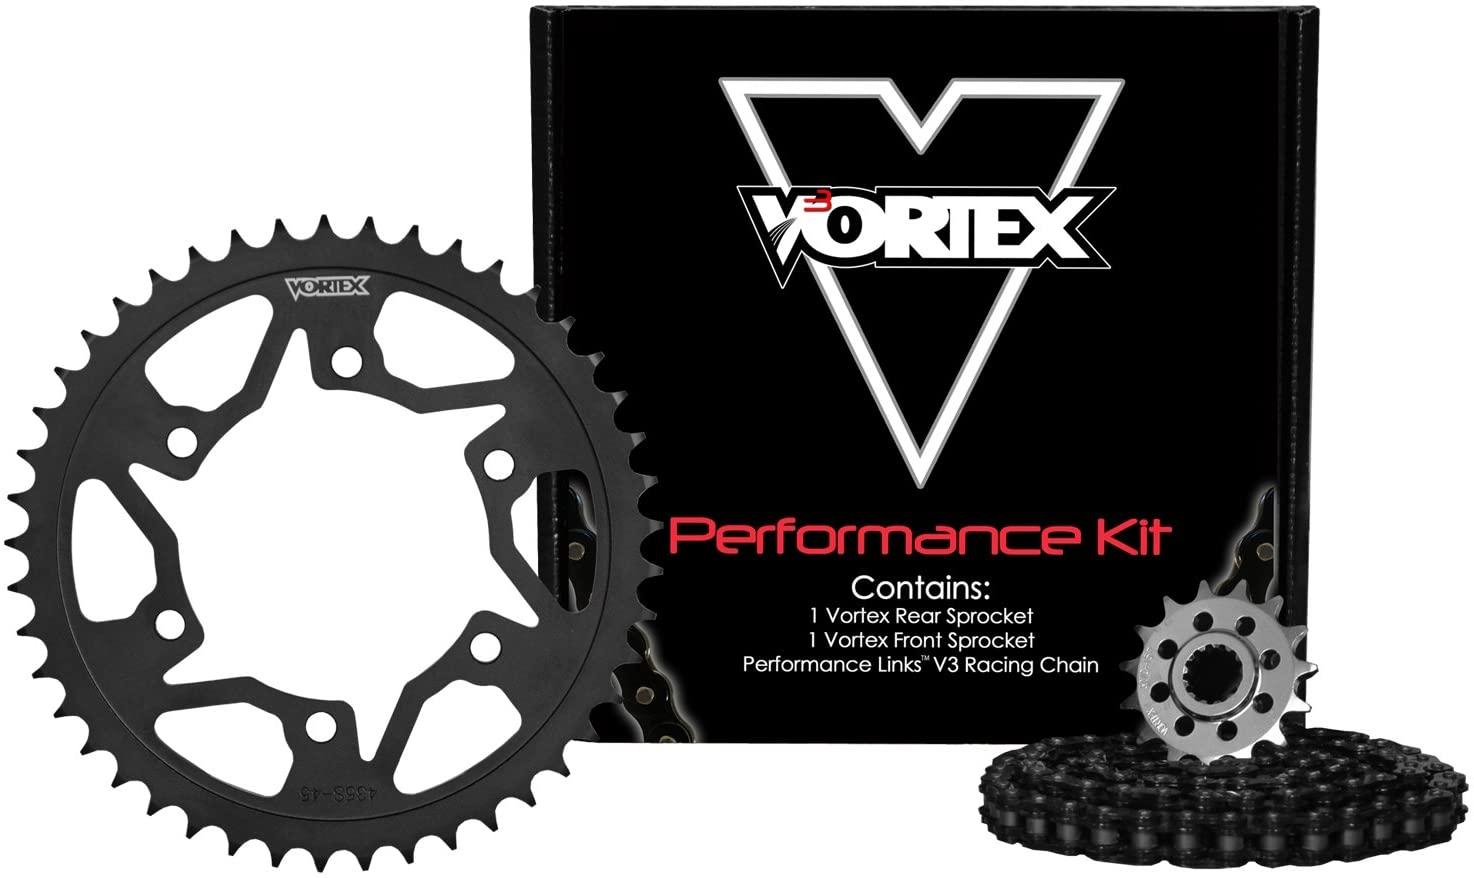 Vortex CK6316 Racing Sprocket Kit